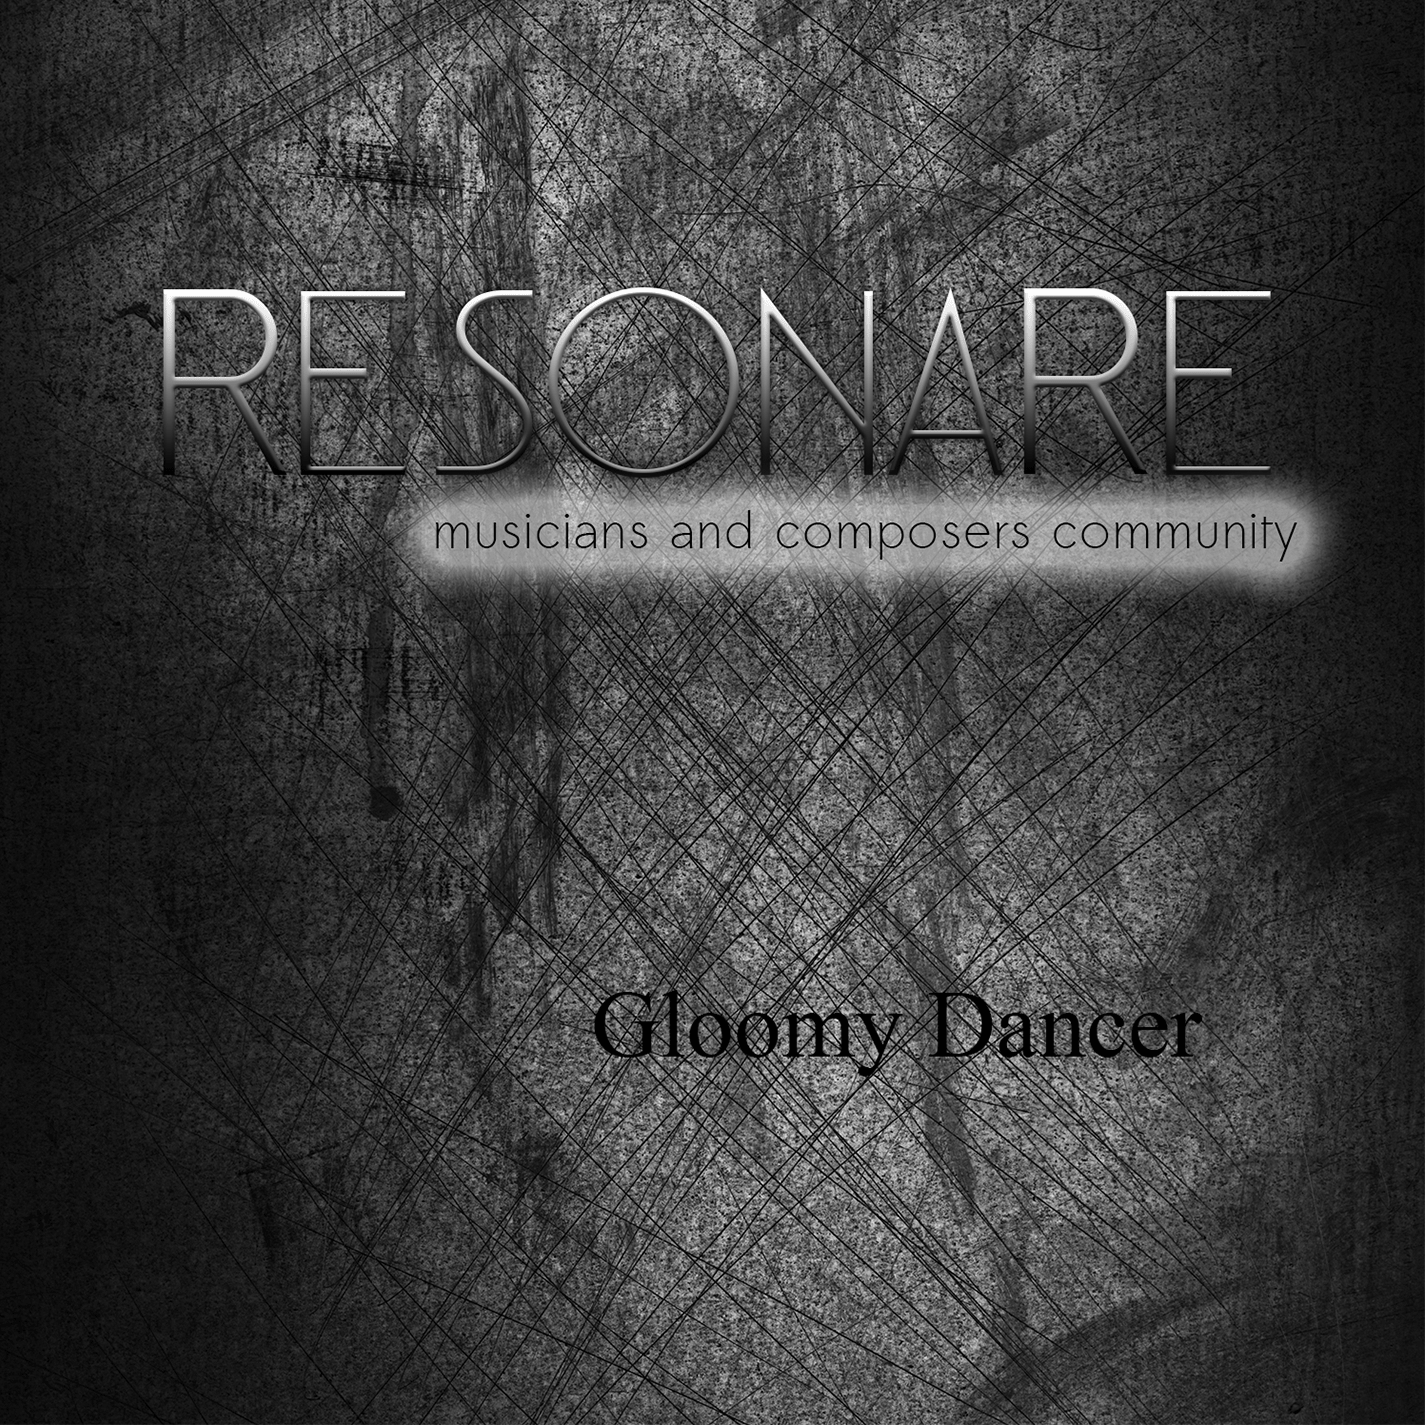 Gloomy Dancer